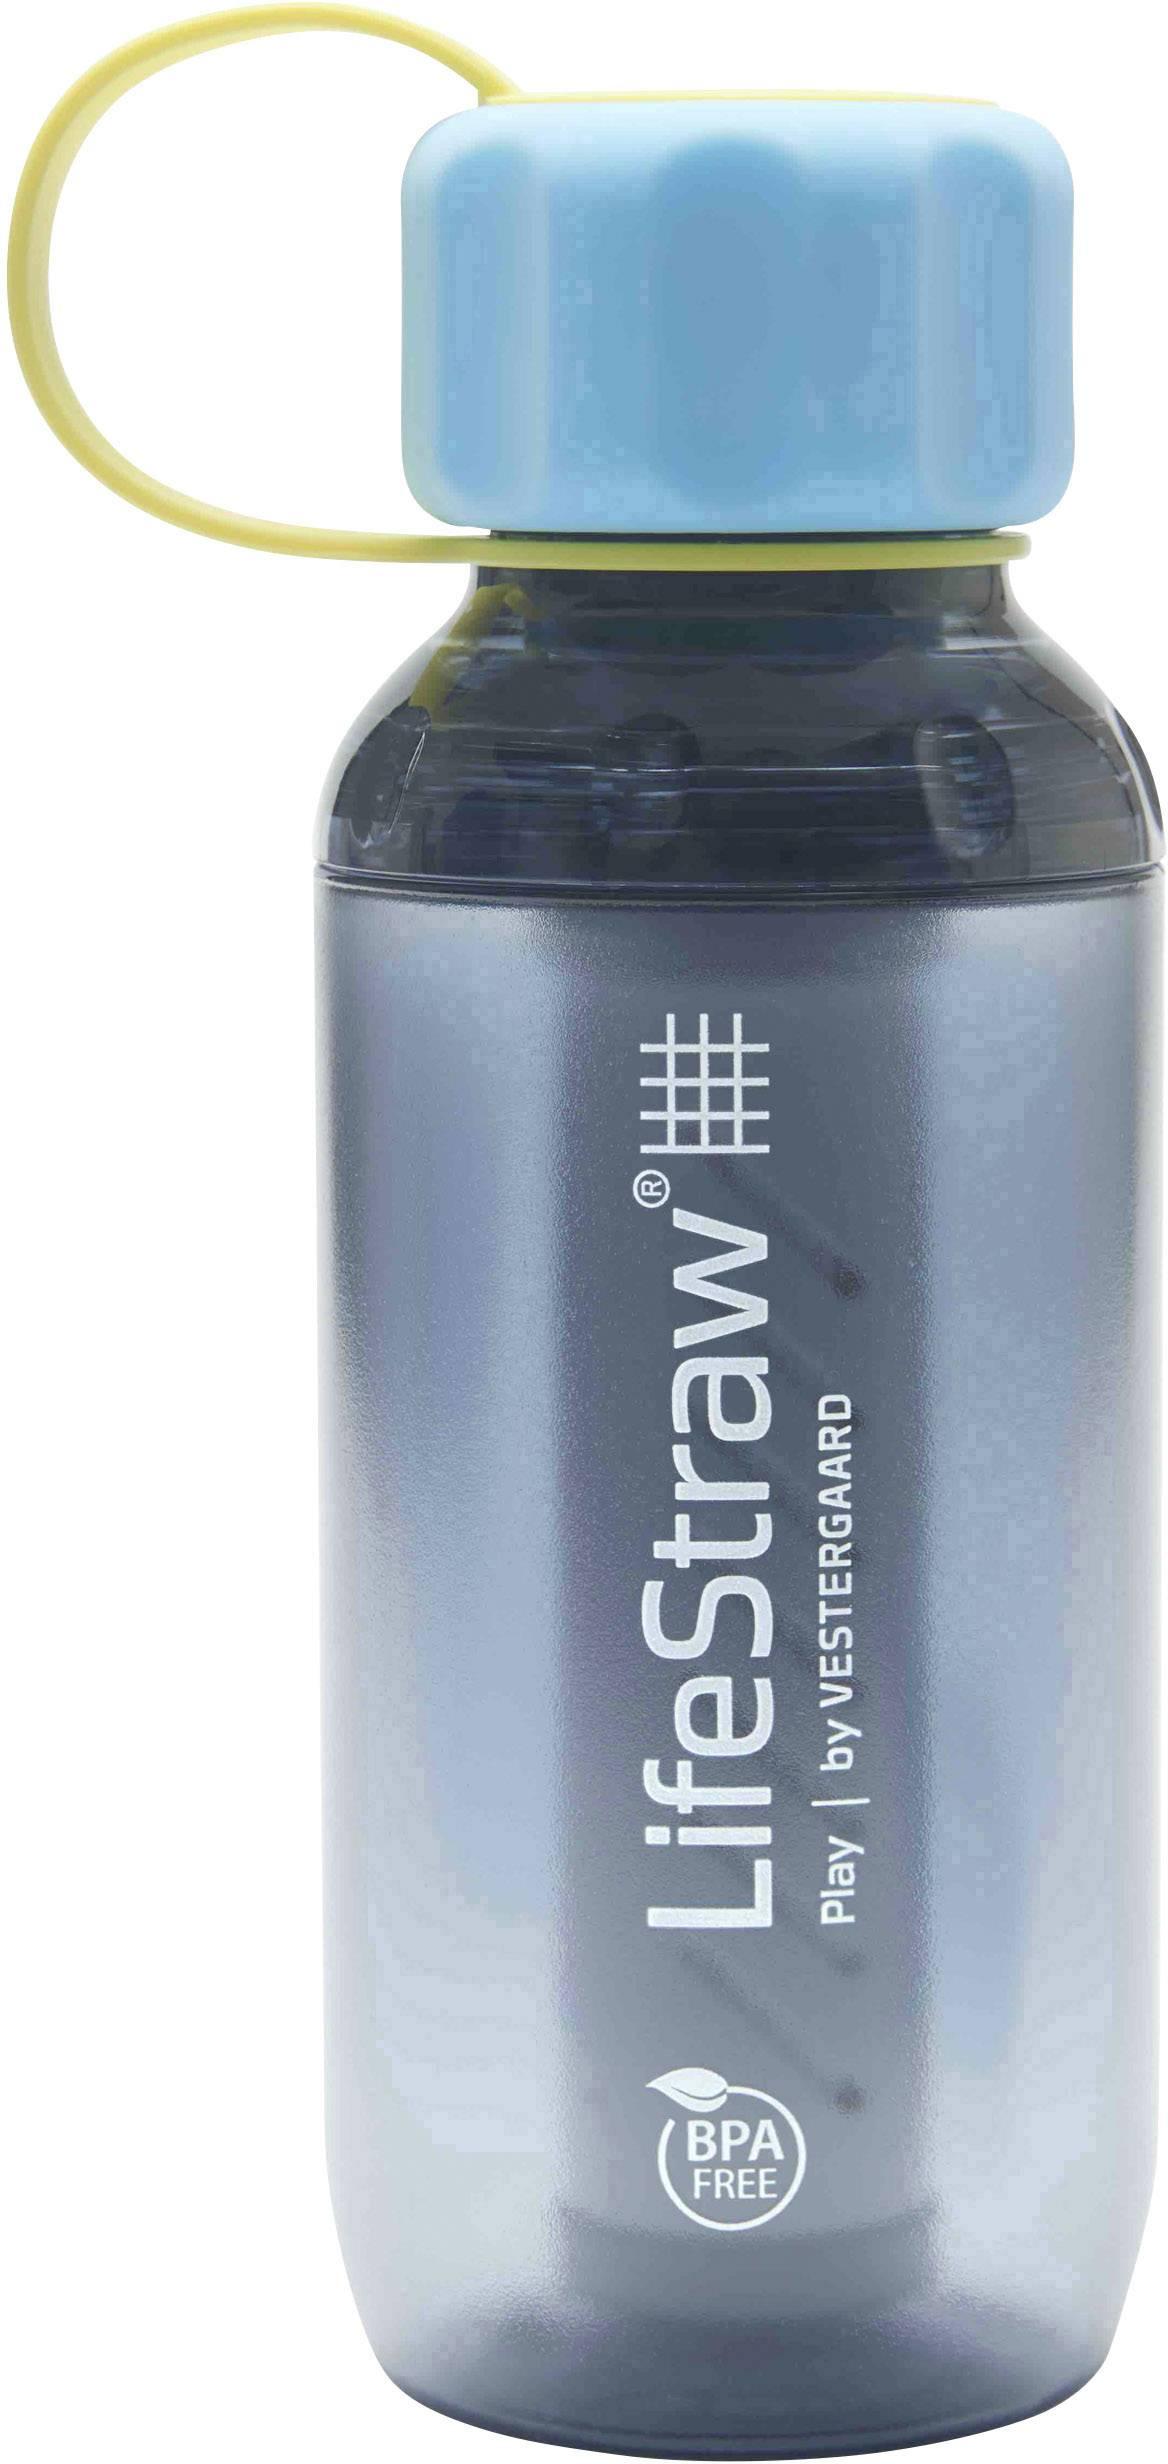 LifeStraw vodní filtr plast 006-6002125 Play 2-Stufig (stormy)